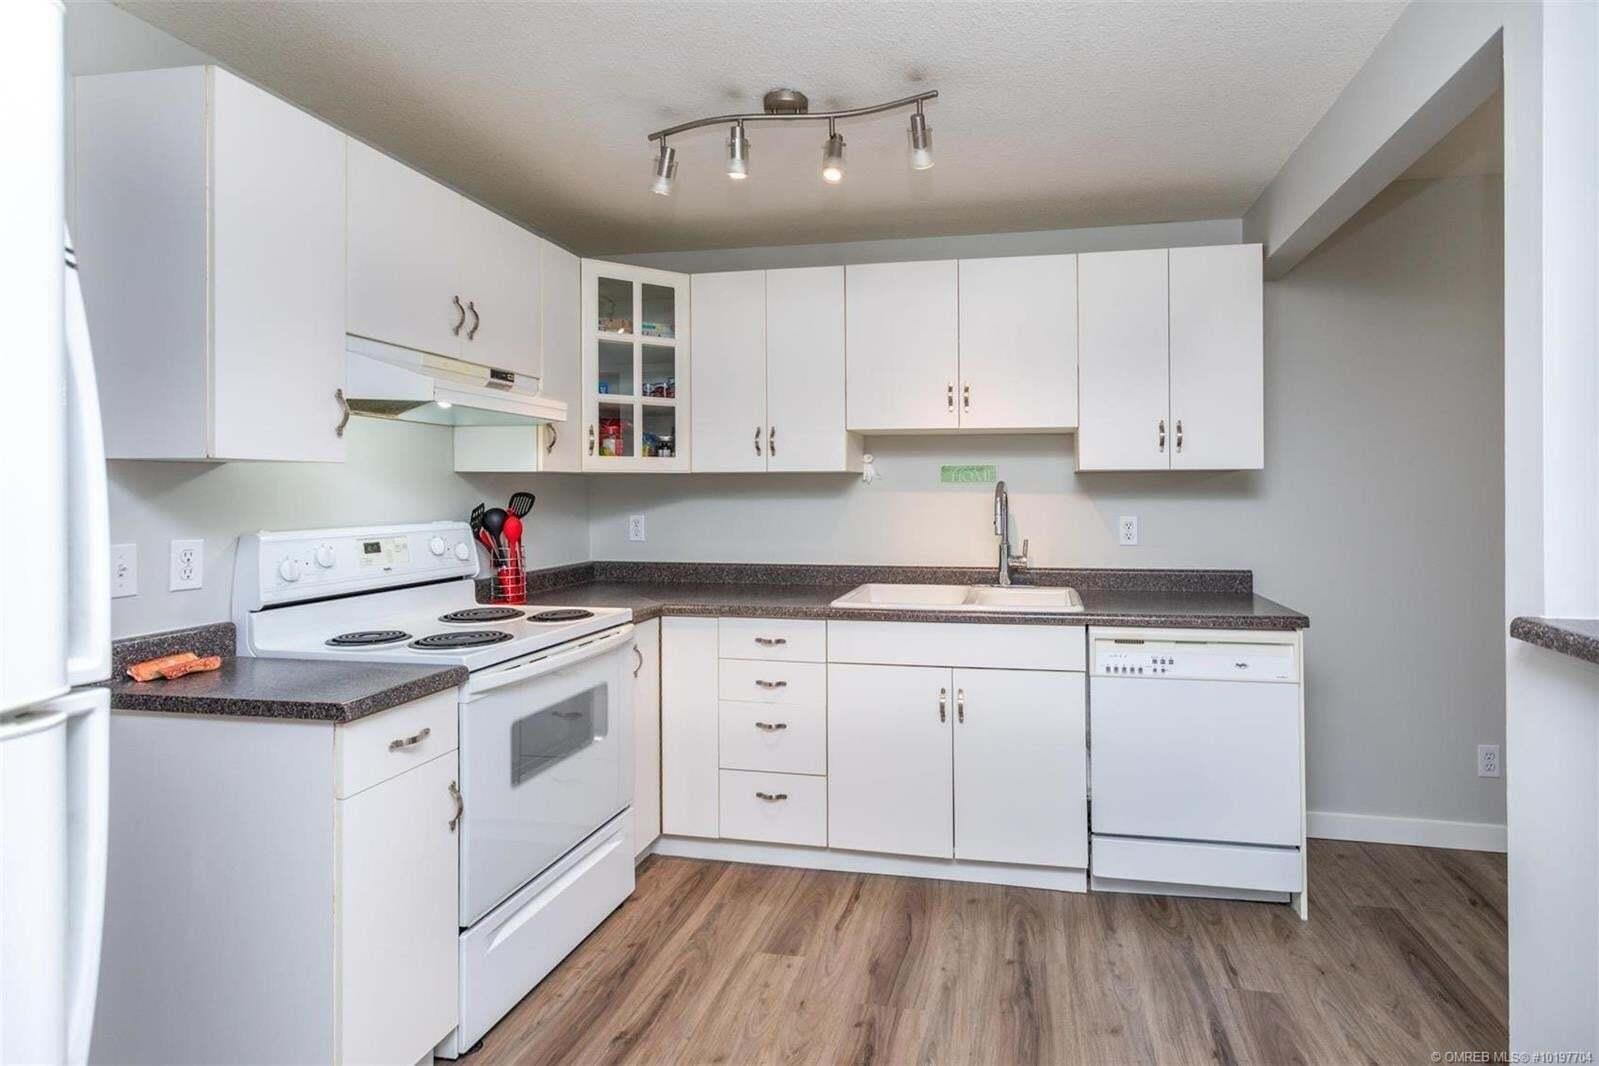 Condo for sale at 727 Houghton Rd Kelowna British Columbia - MLS: 10197704